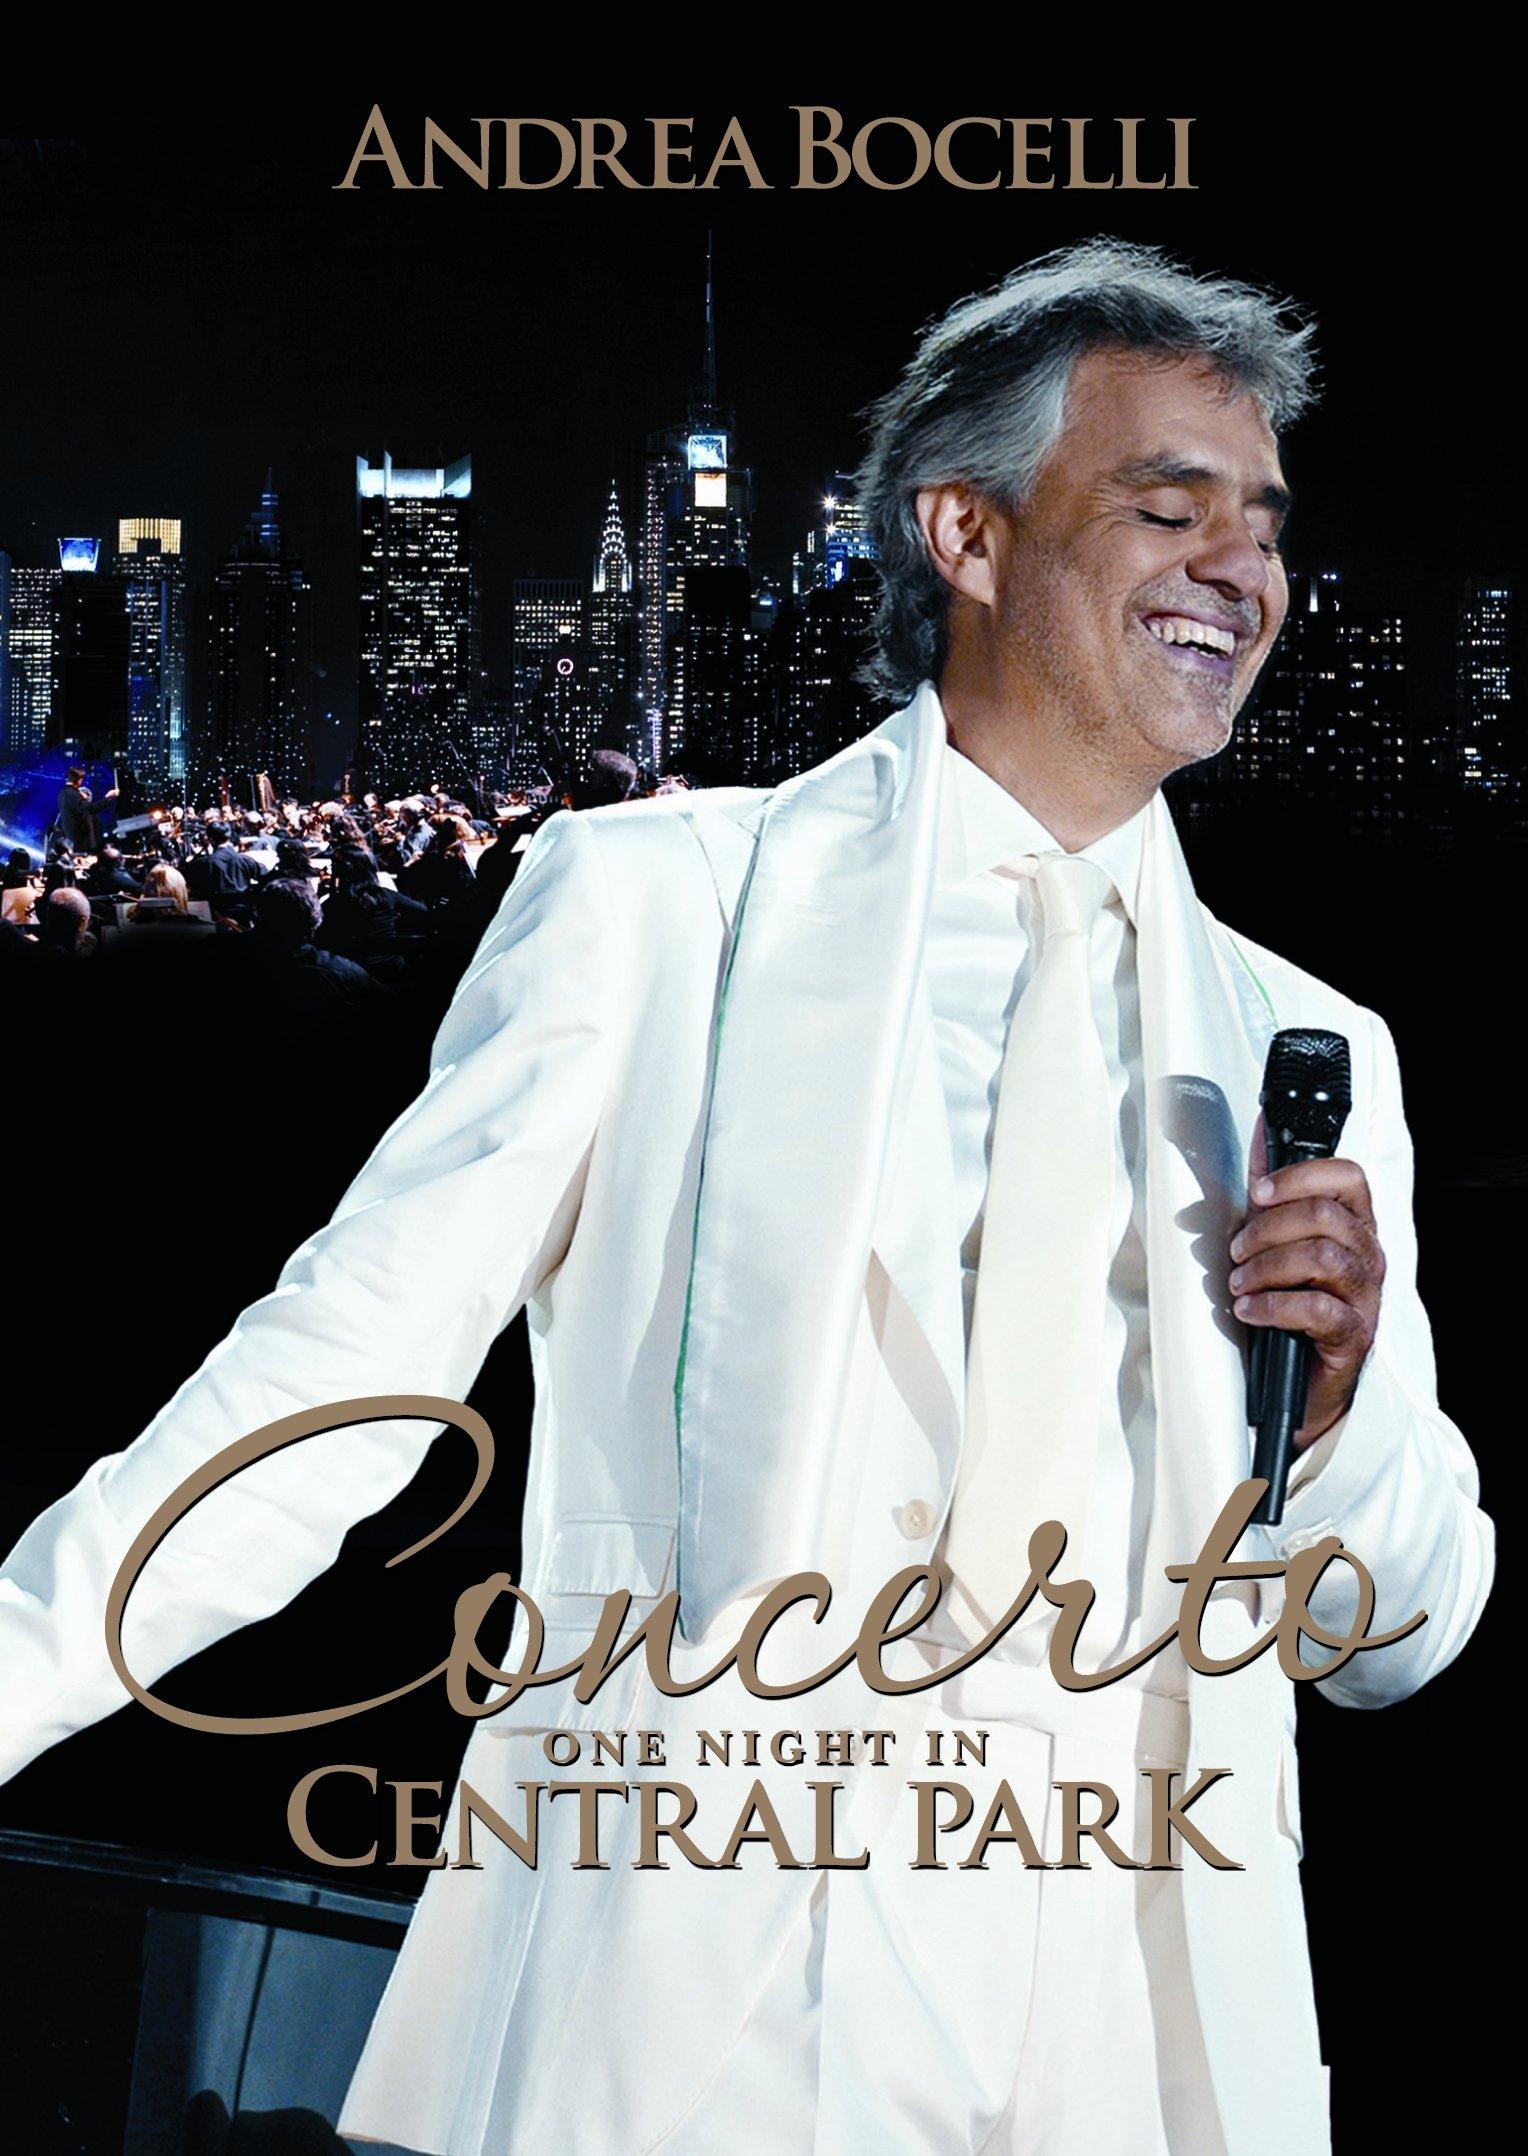 DVD : Andrea Bocelli - Concerto One Night in Central Park (DVD)